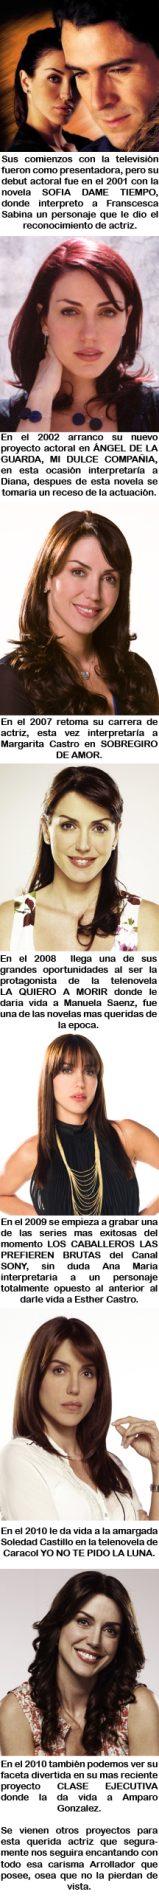 Ana Maria Trujillo - Historia Actoral